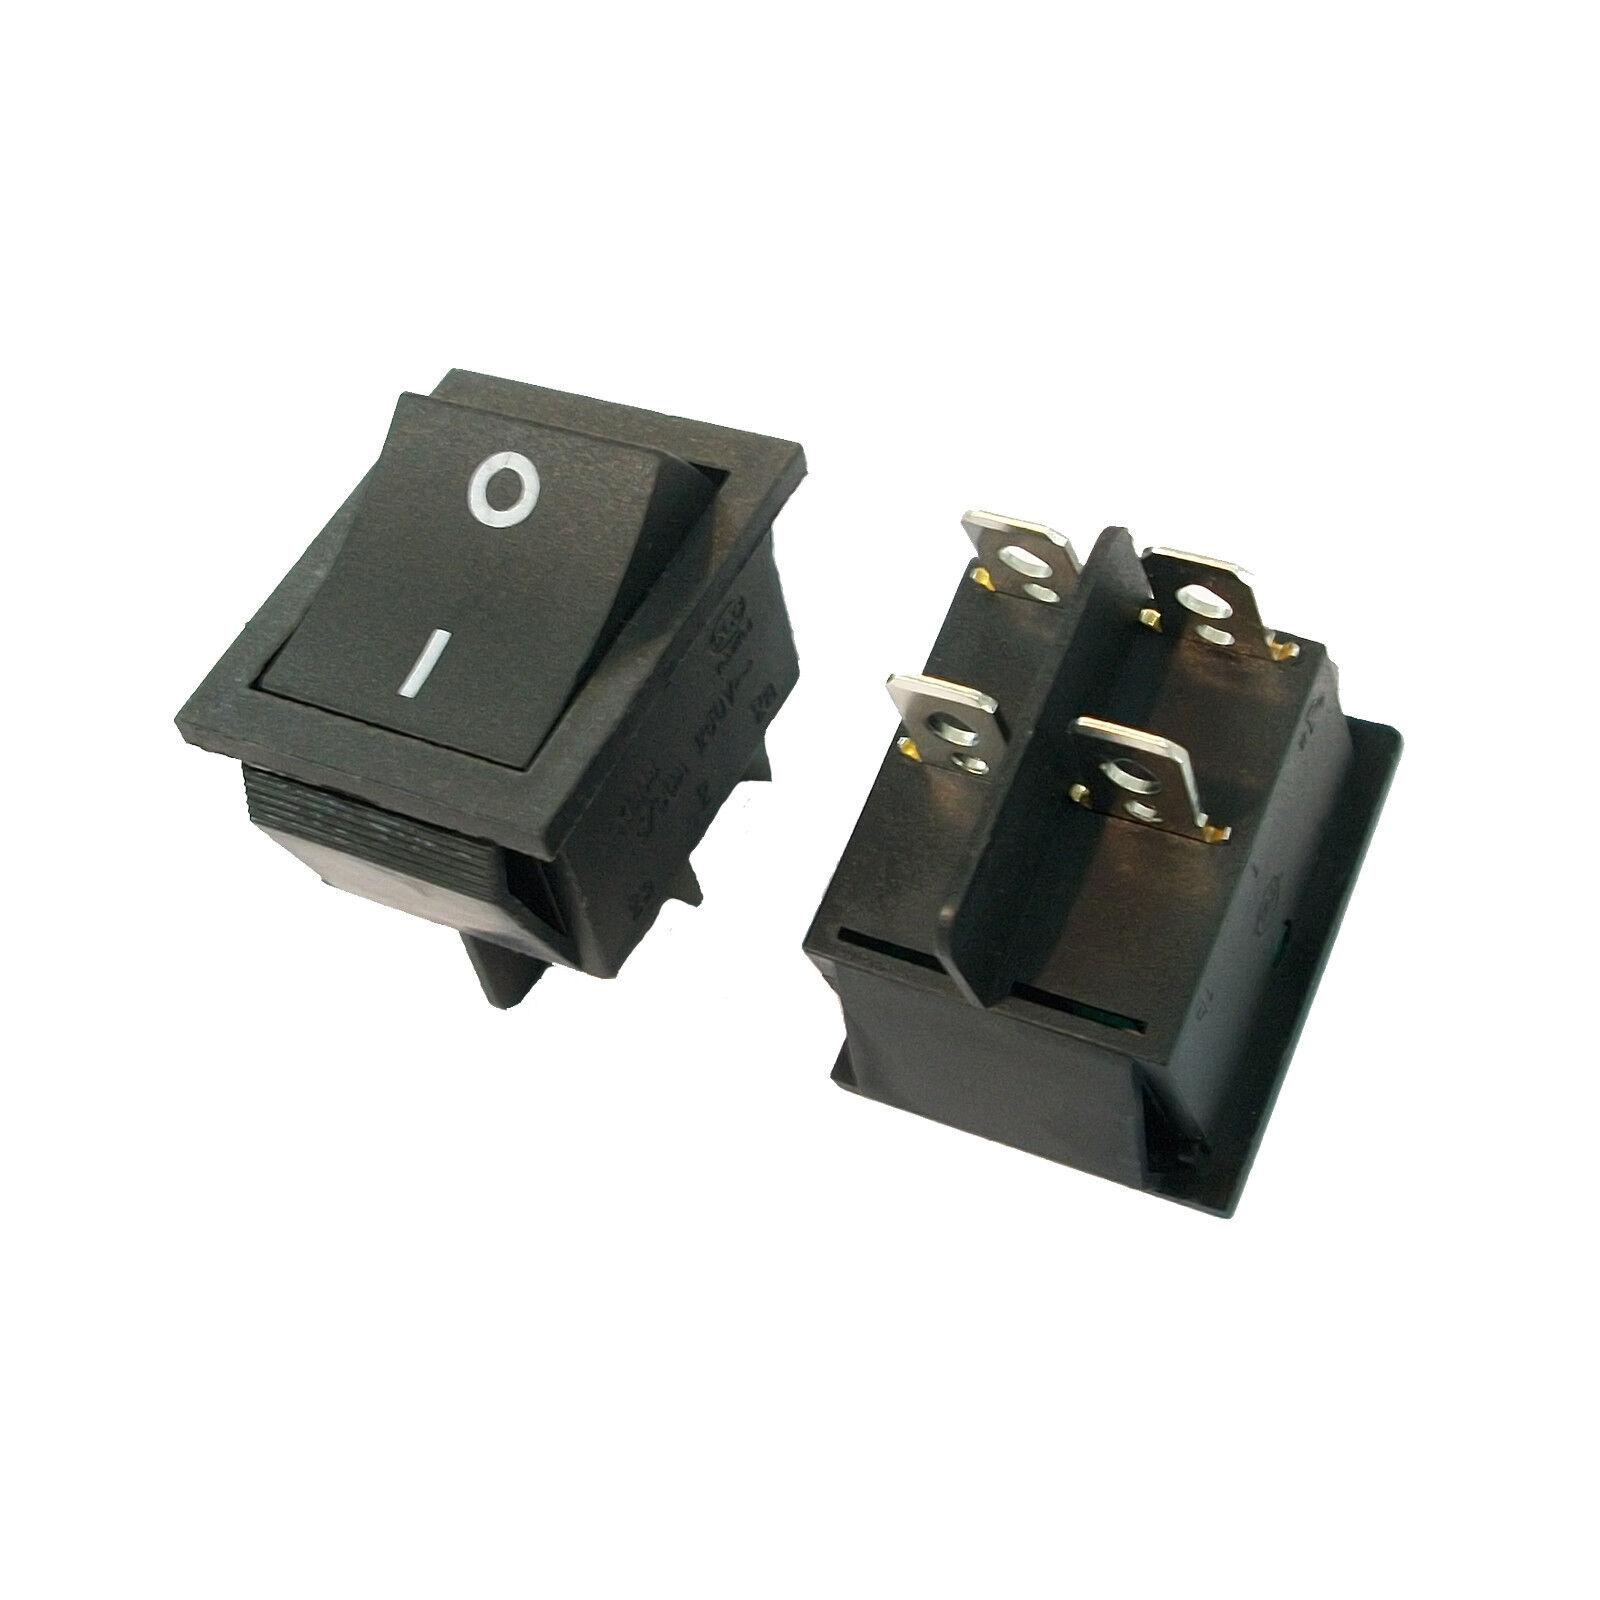 20 X 32mm 4 Pin DPST On/off Boat Car Rocker Switch Kcd4-201n Black ...